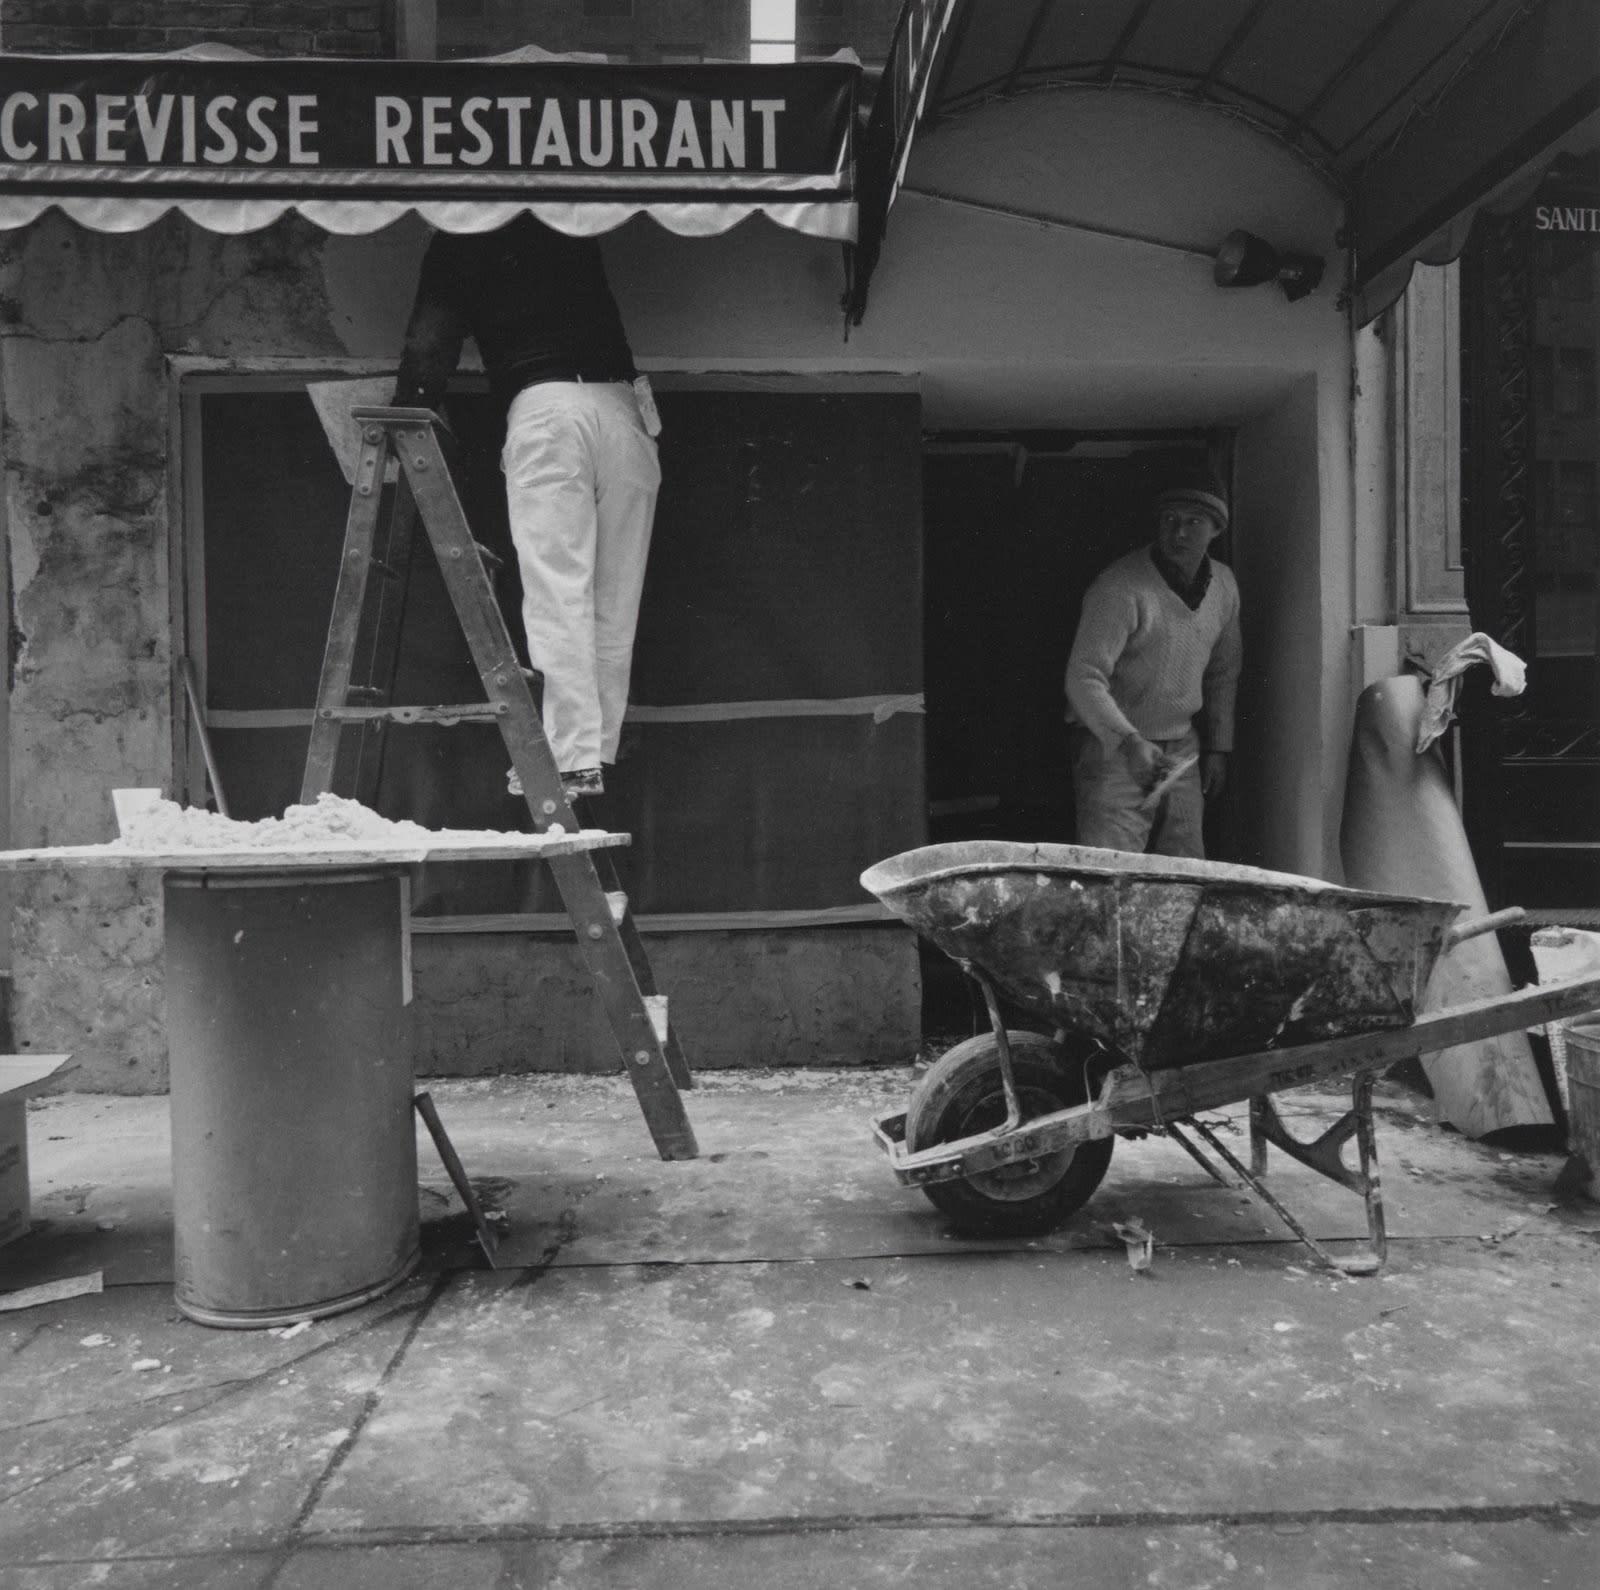 Steven Rifkin Untitled, NYC Tirage gélatino-argentique 17,8 x 17,8 cm Dim. papier: 20,3 x 25 cm